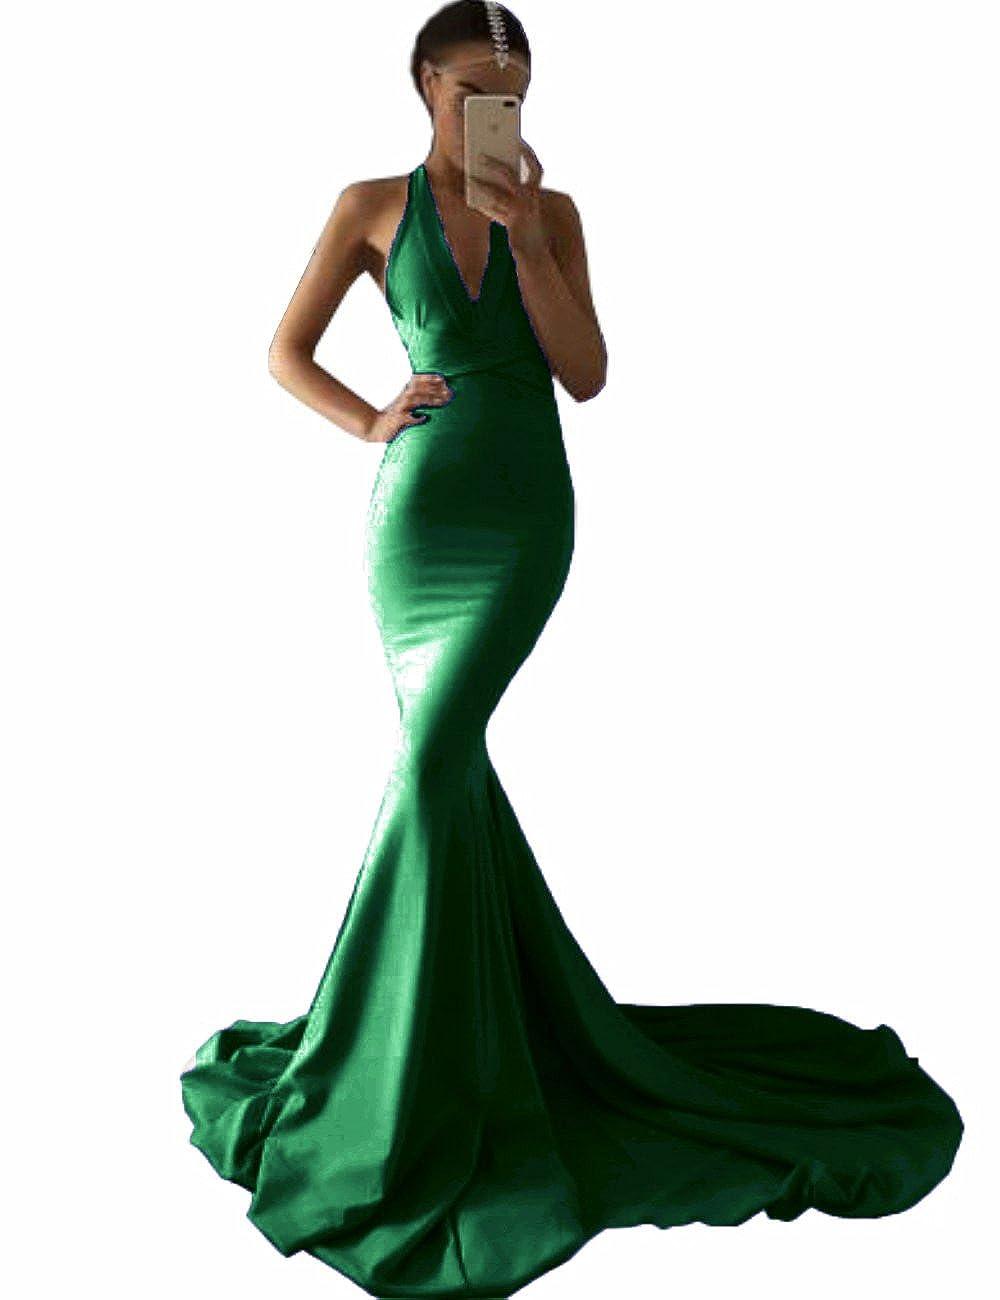 Emerald MariRobe Women's Deep V Neck Backless Evening Dress Spandex Mermaid Formal Party Dress Prom Gown 2019